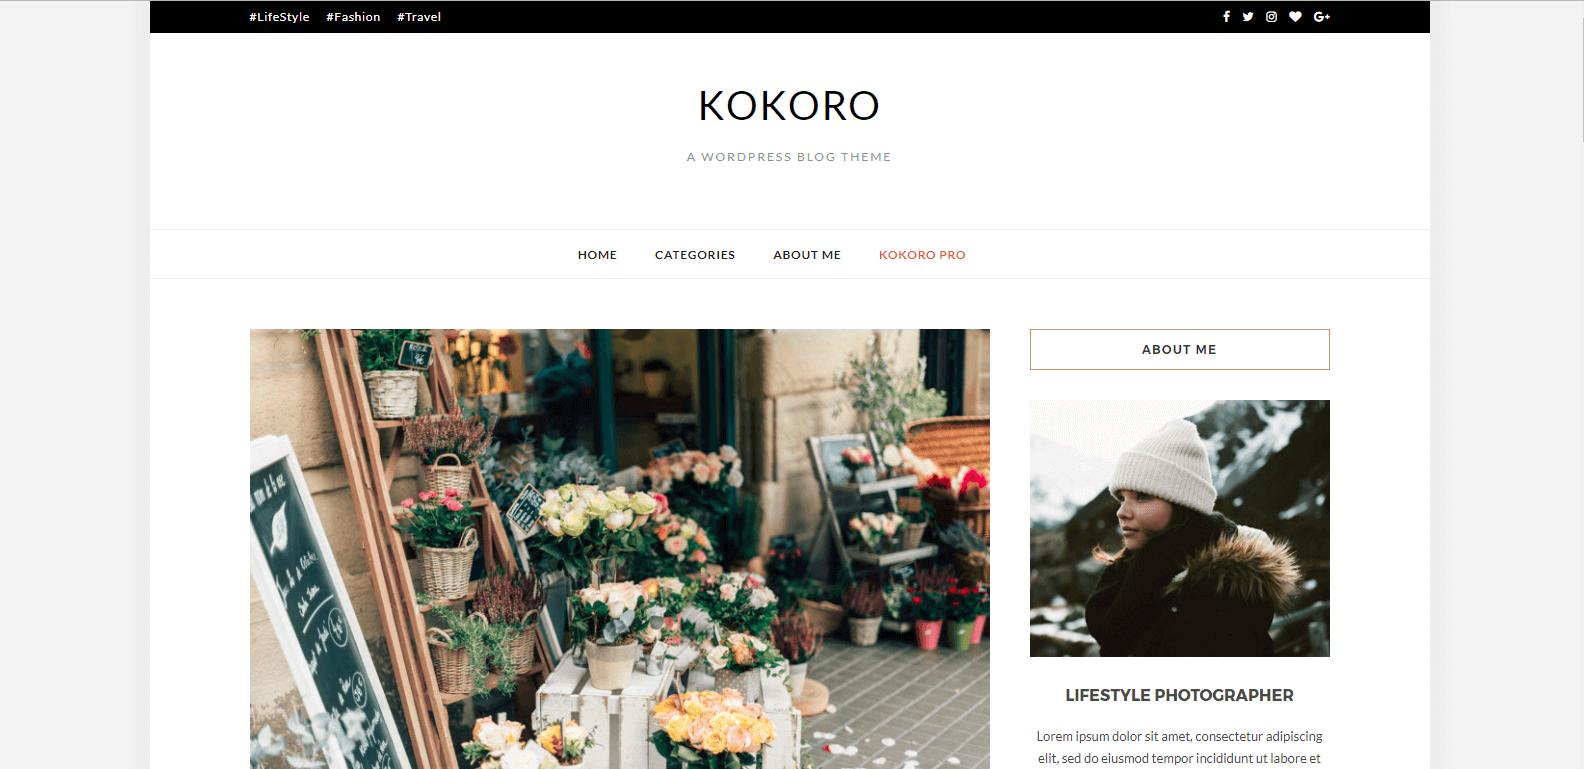 WordPress博客主题:Kokoro 汉化版